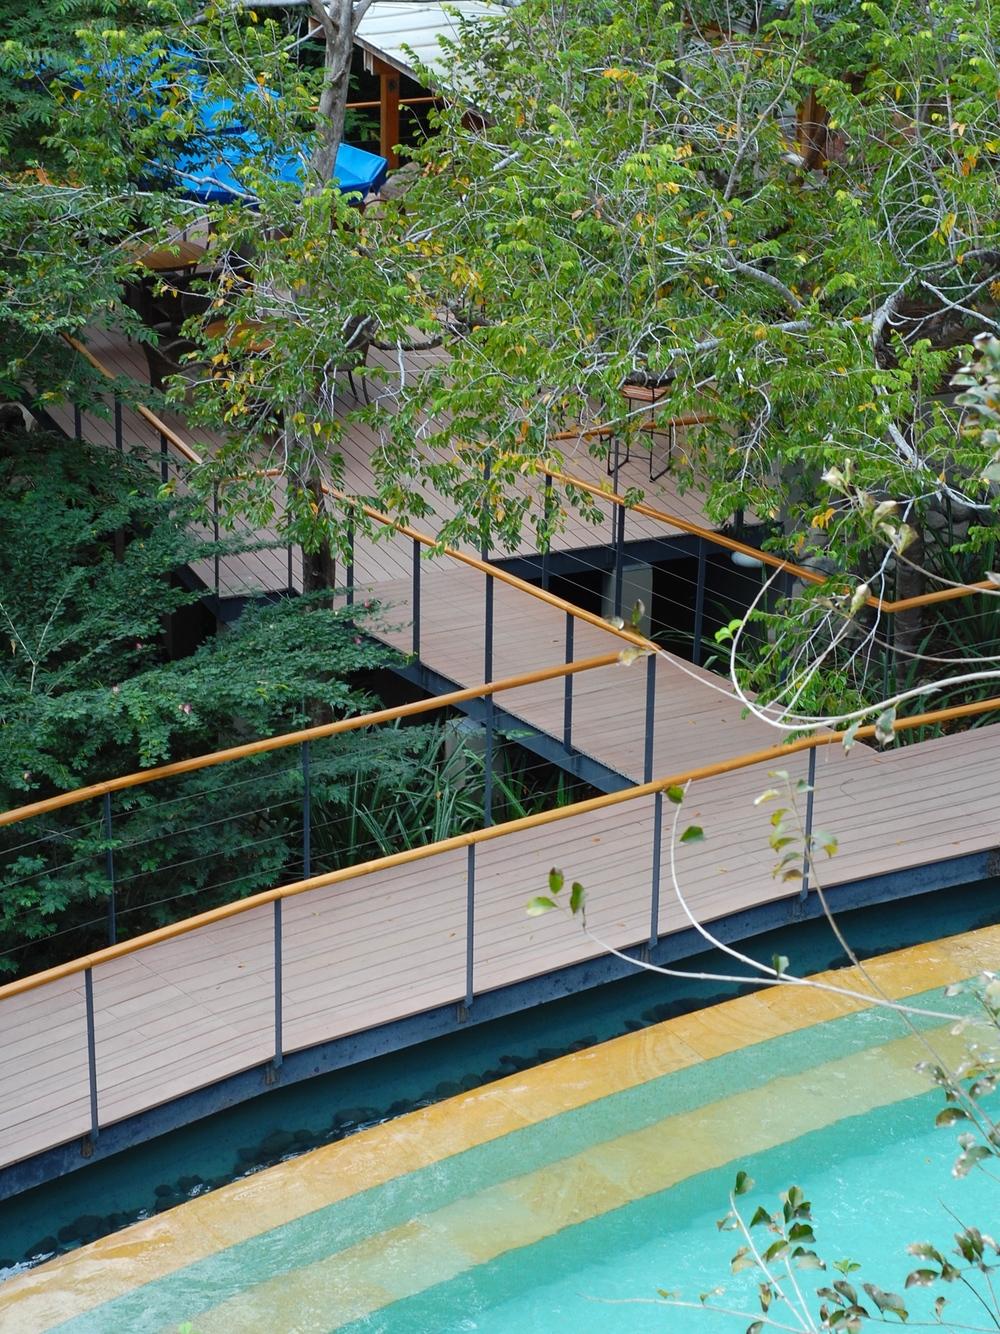 Pool deck at Rio Perdido